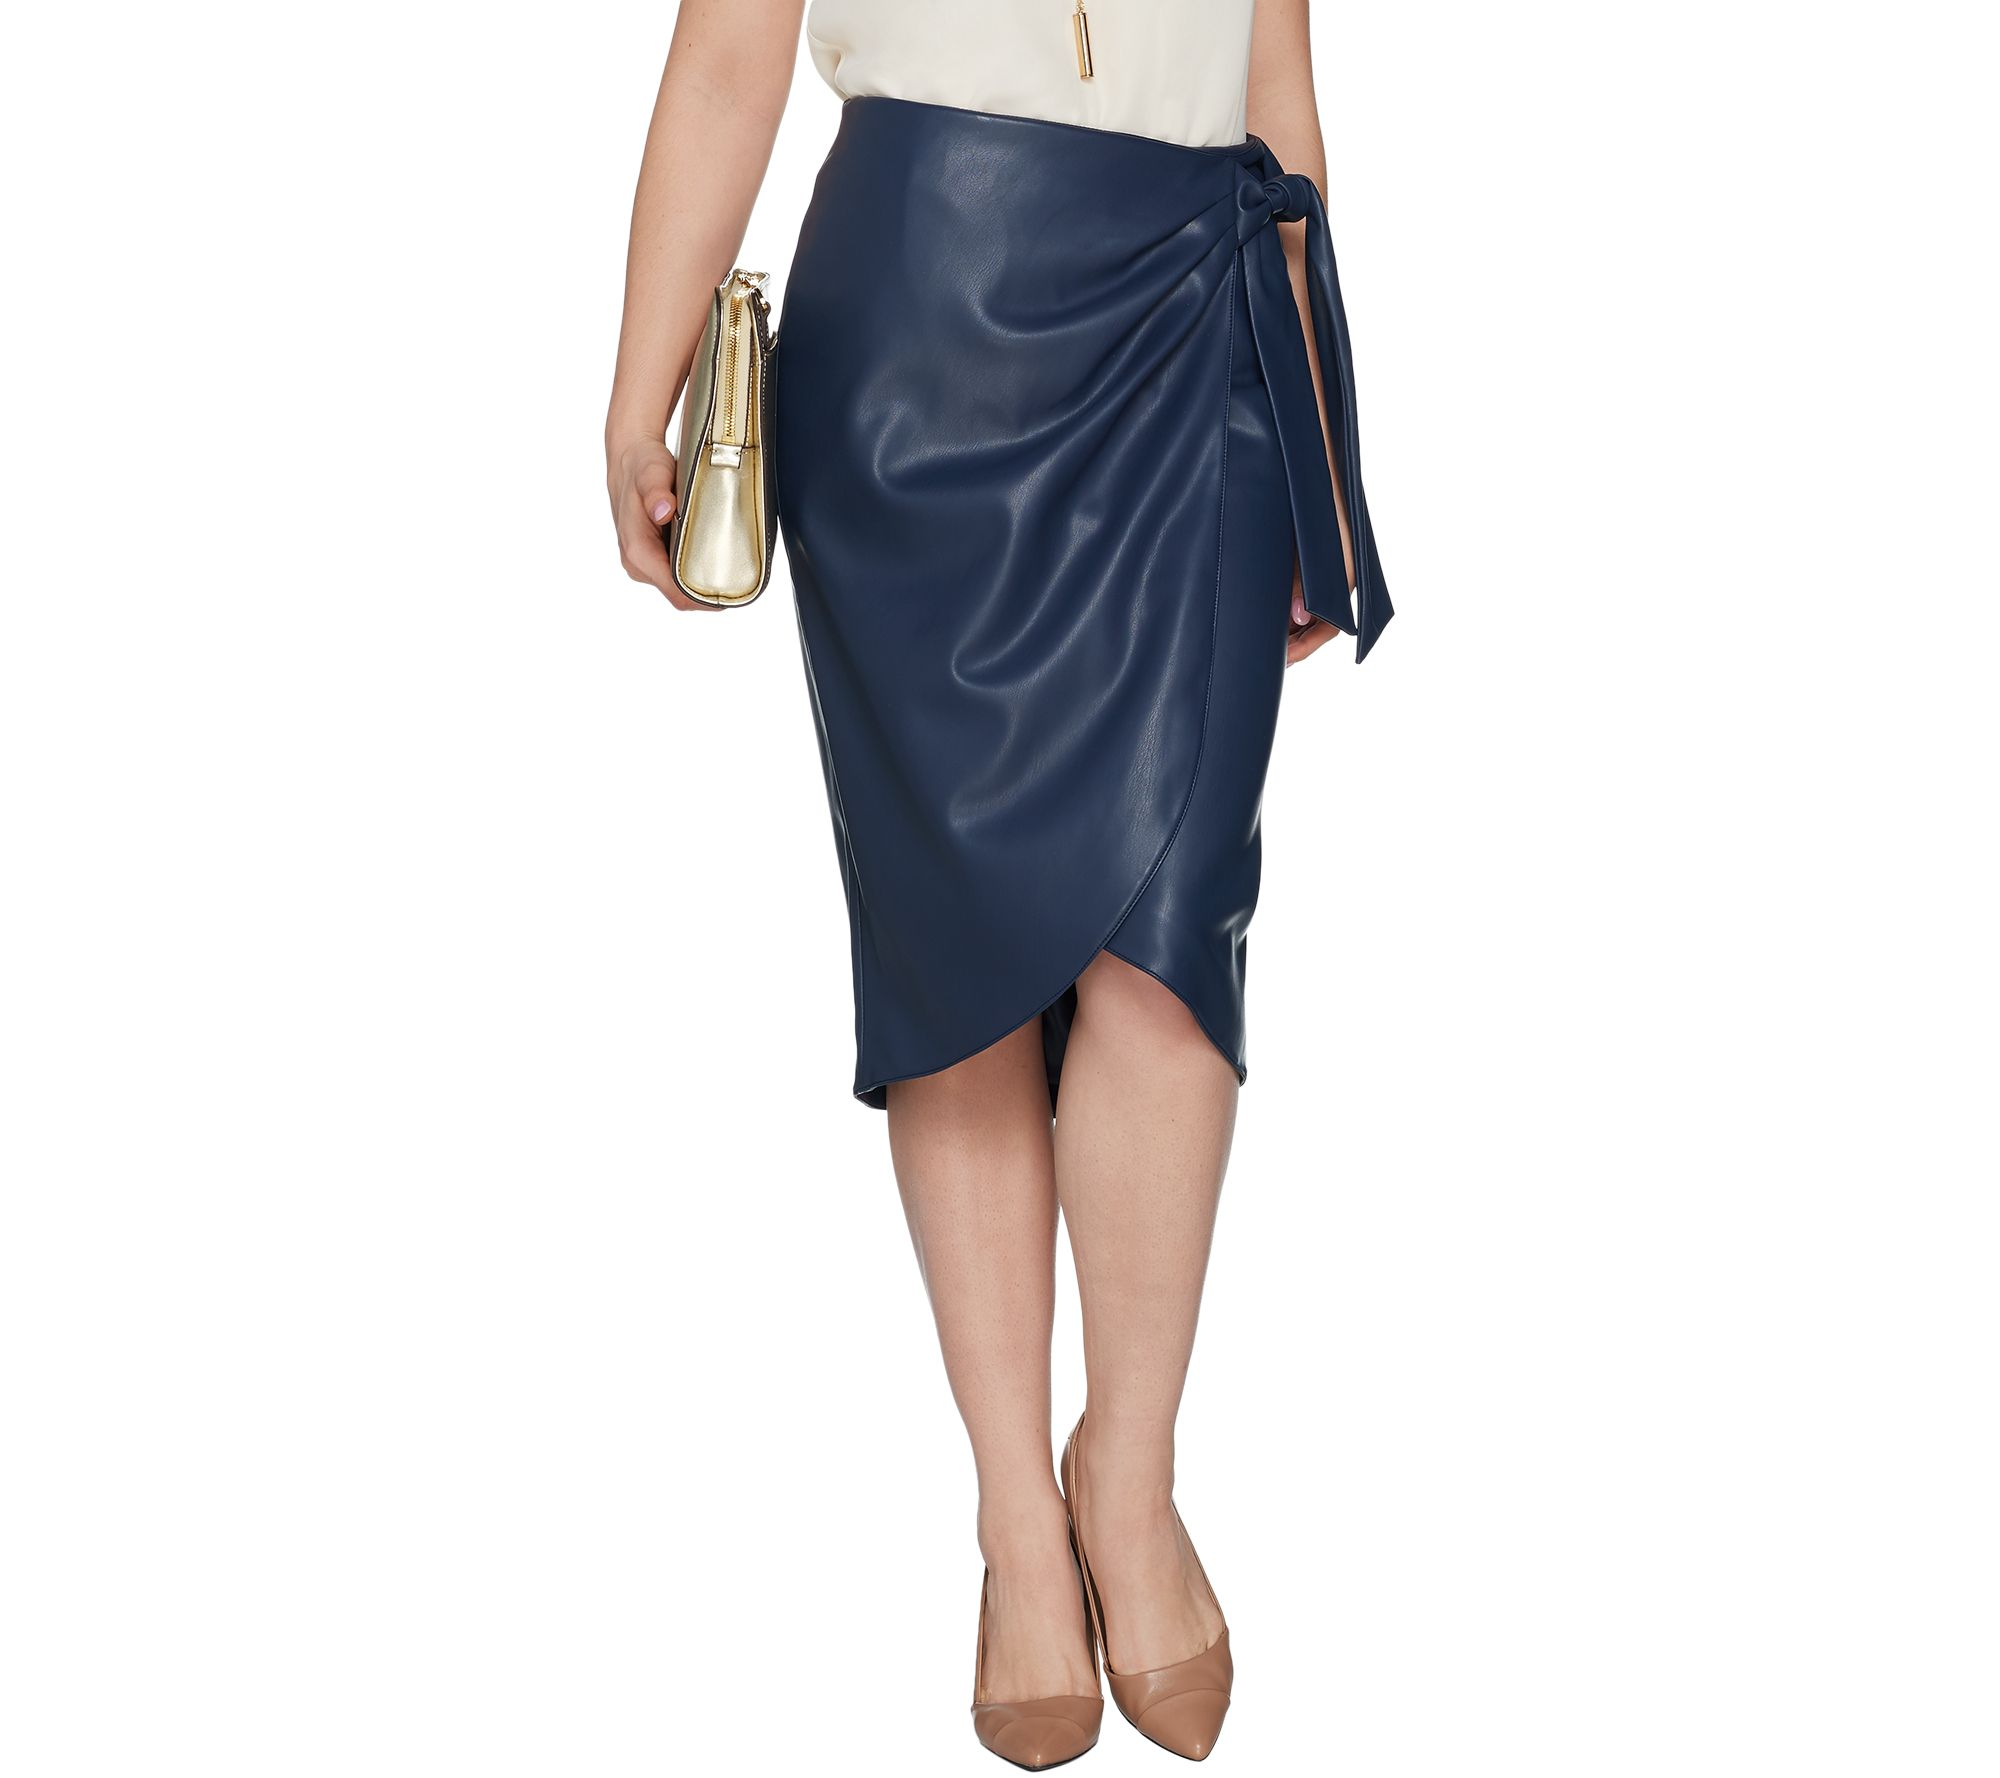 bdf31d2fa4 G.I.L.I. Side Tie Faux Leather Skirt - Page 1 — QVC.com